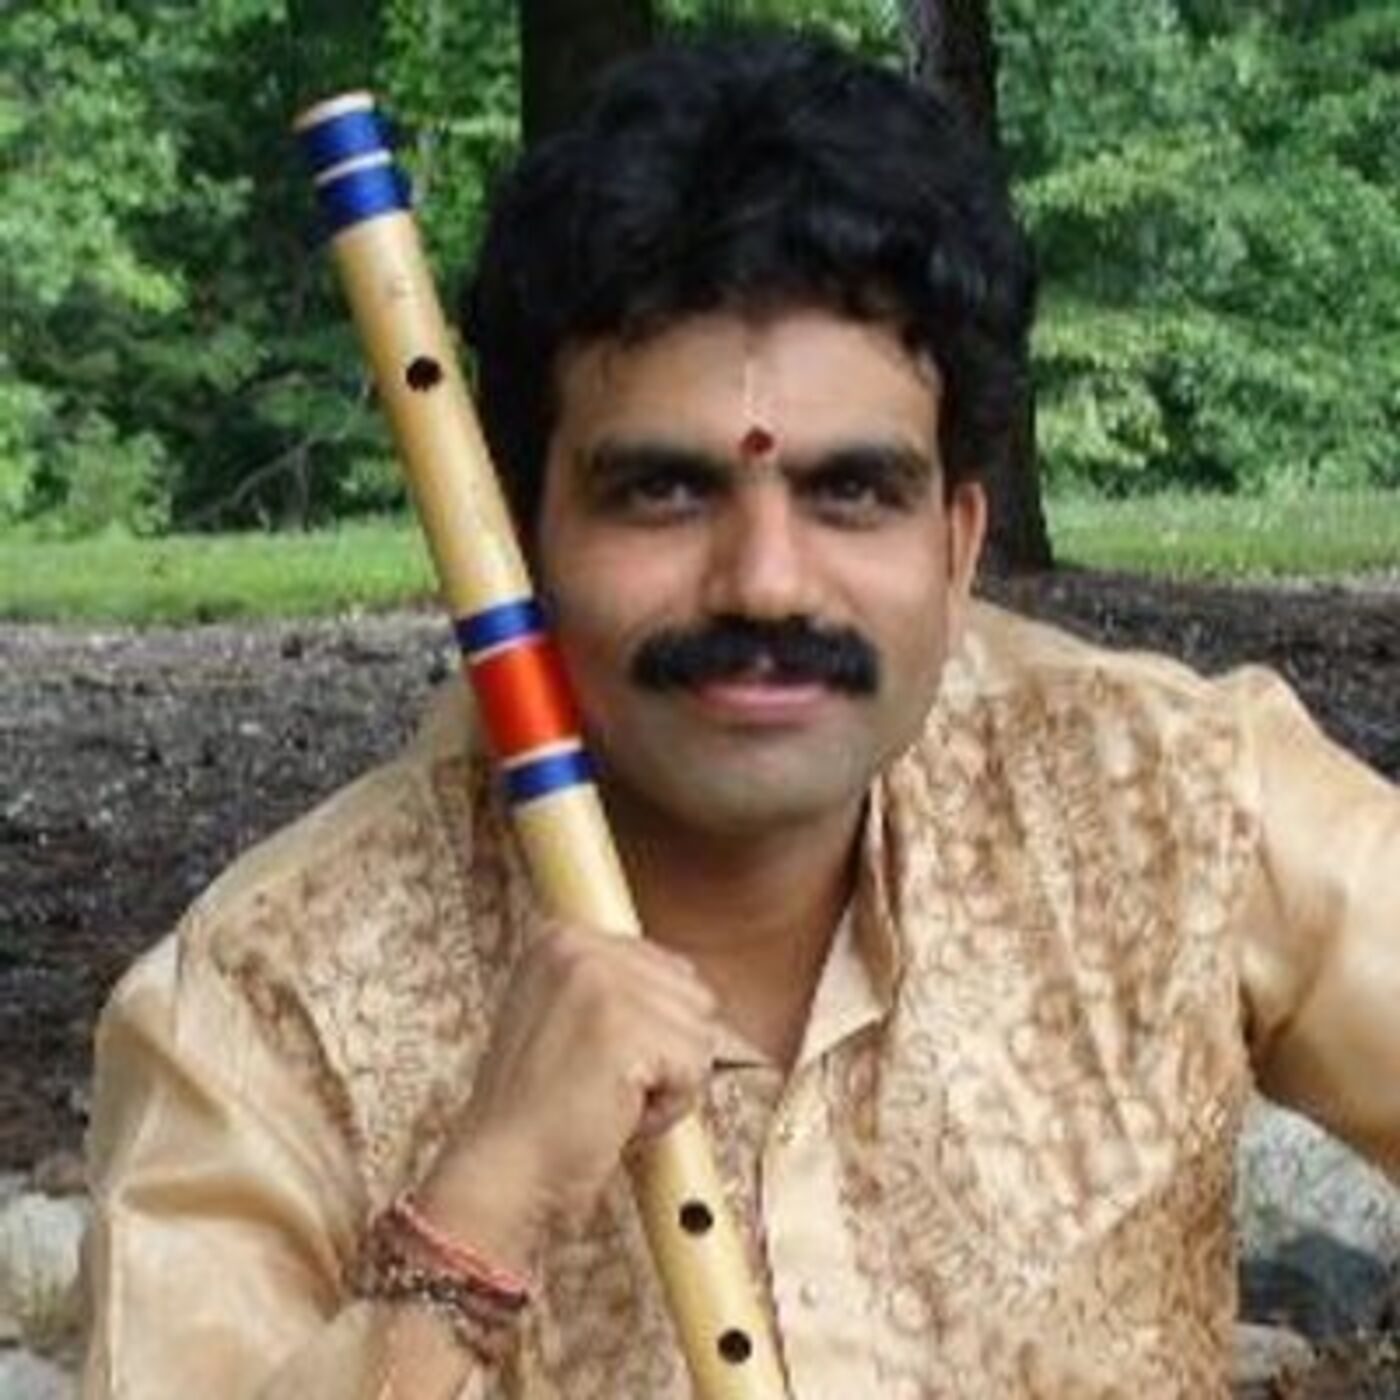 [Bonus] Music Mashtun: Flute Raman performs Krishna Flute Music!